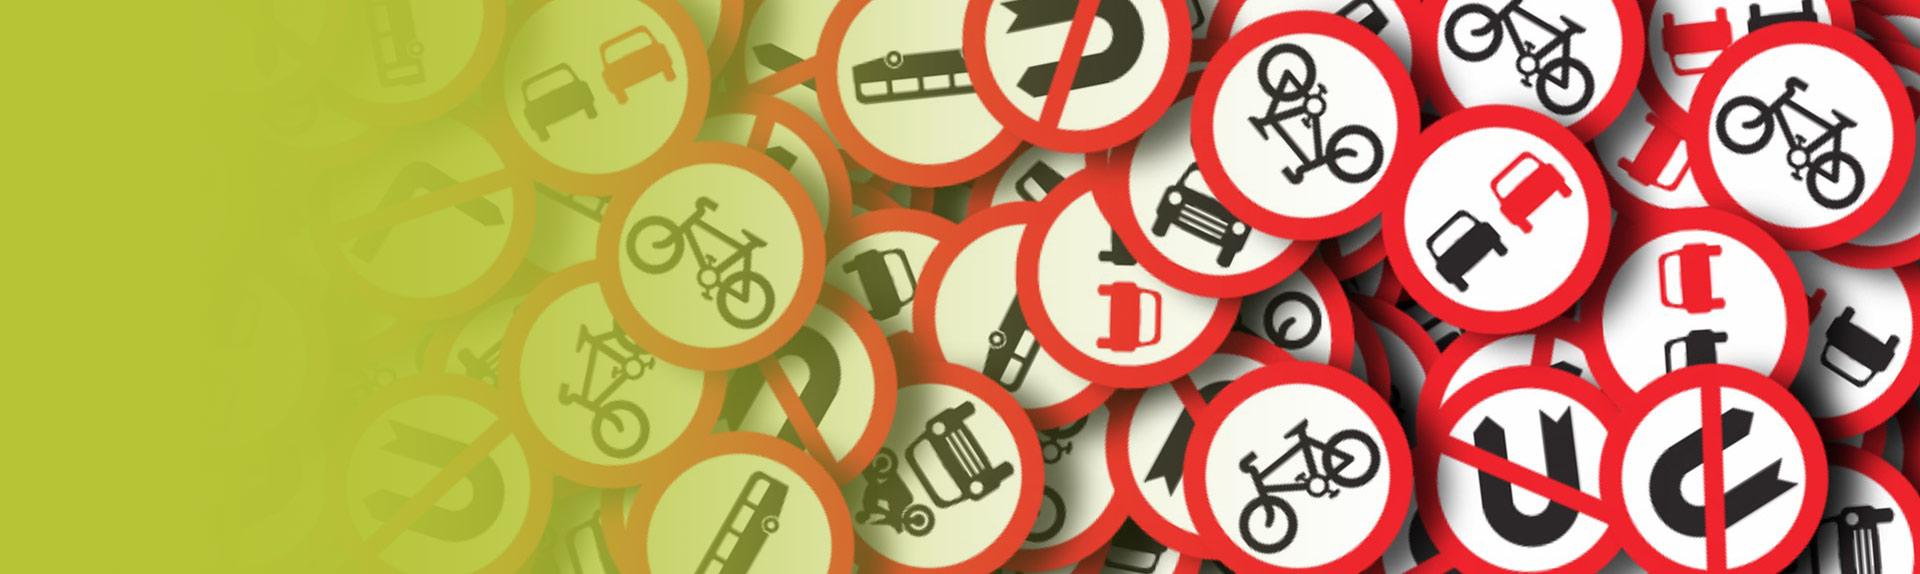 Drivers Useful Information